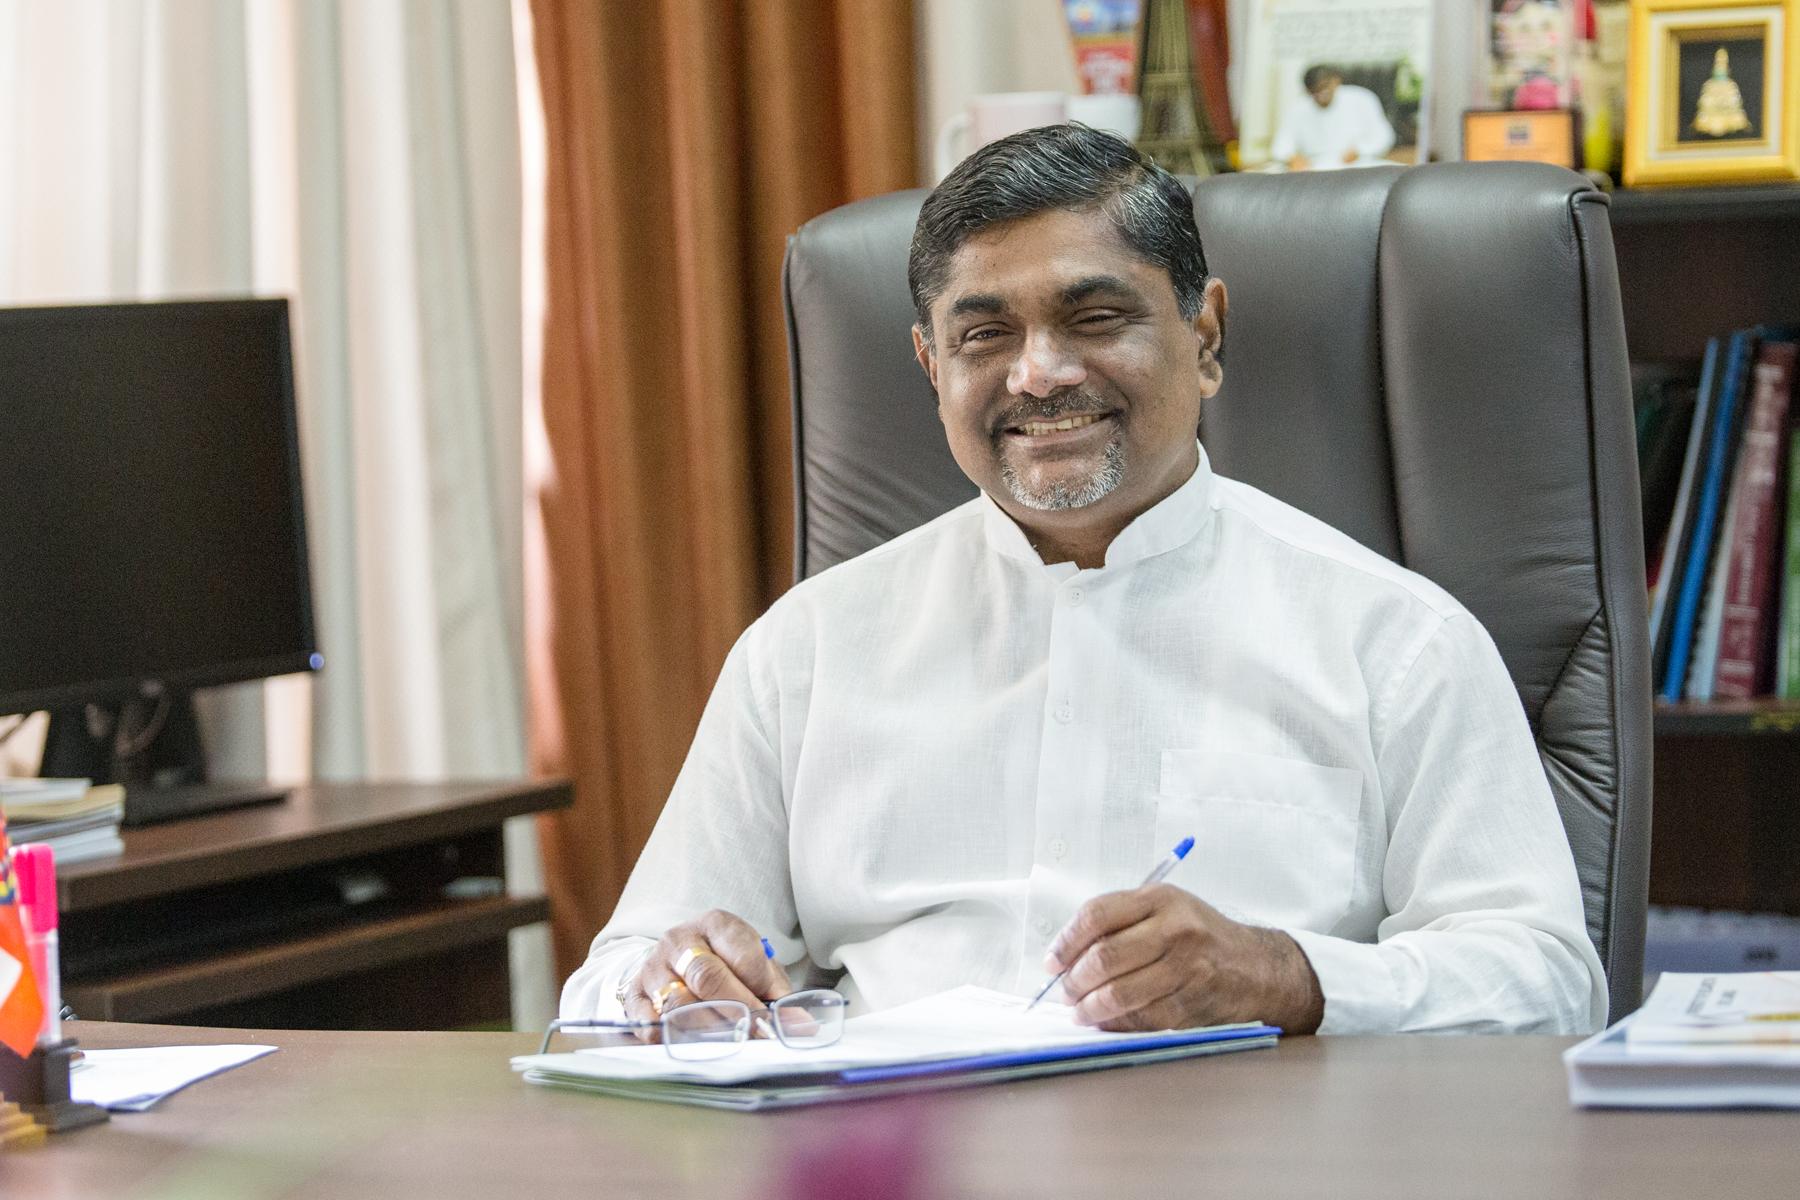 Prof. Lakshman Senevirathne